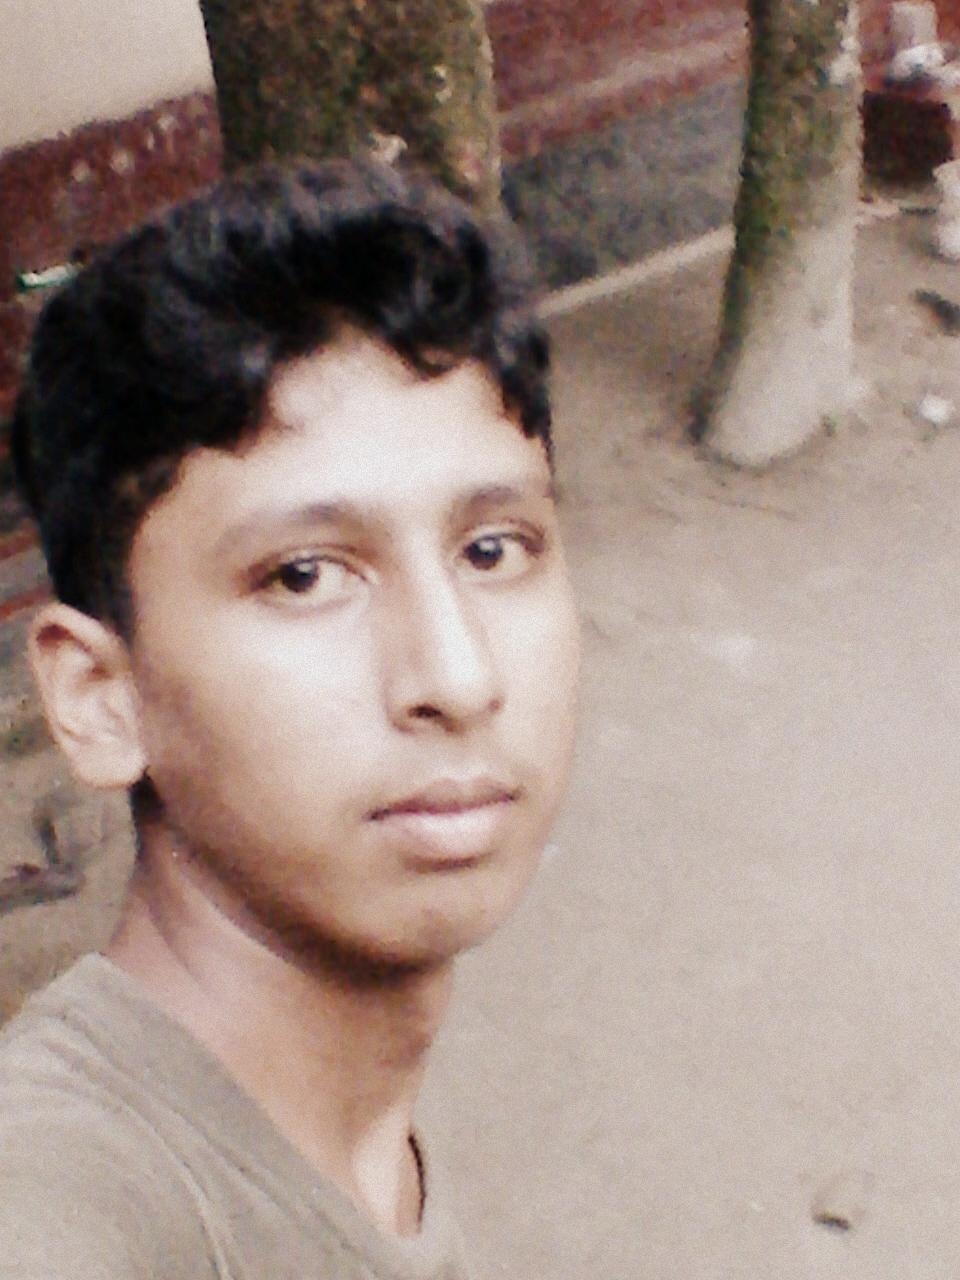 emon shaha